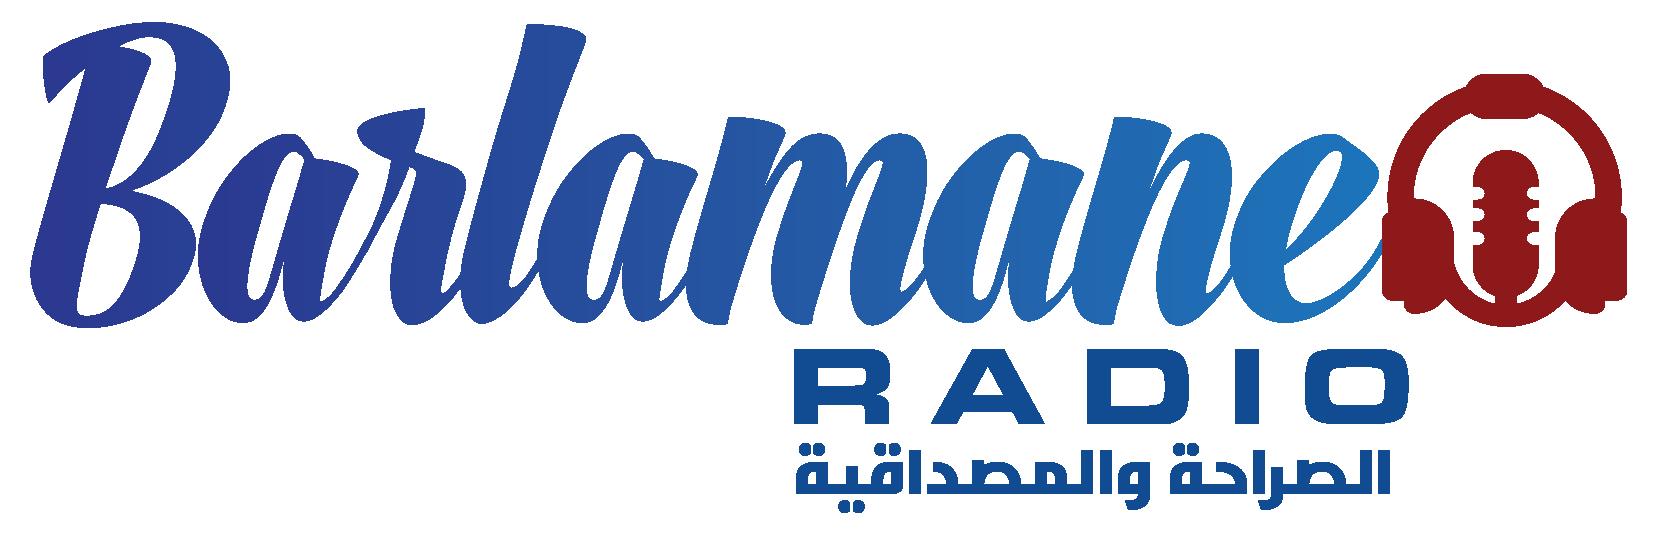 barlamane radio برلمان راديو